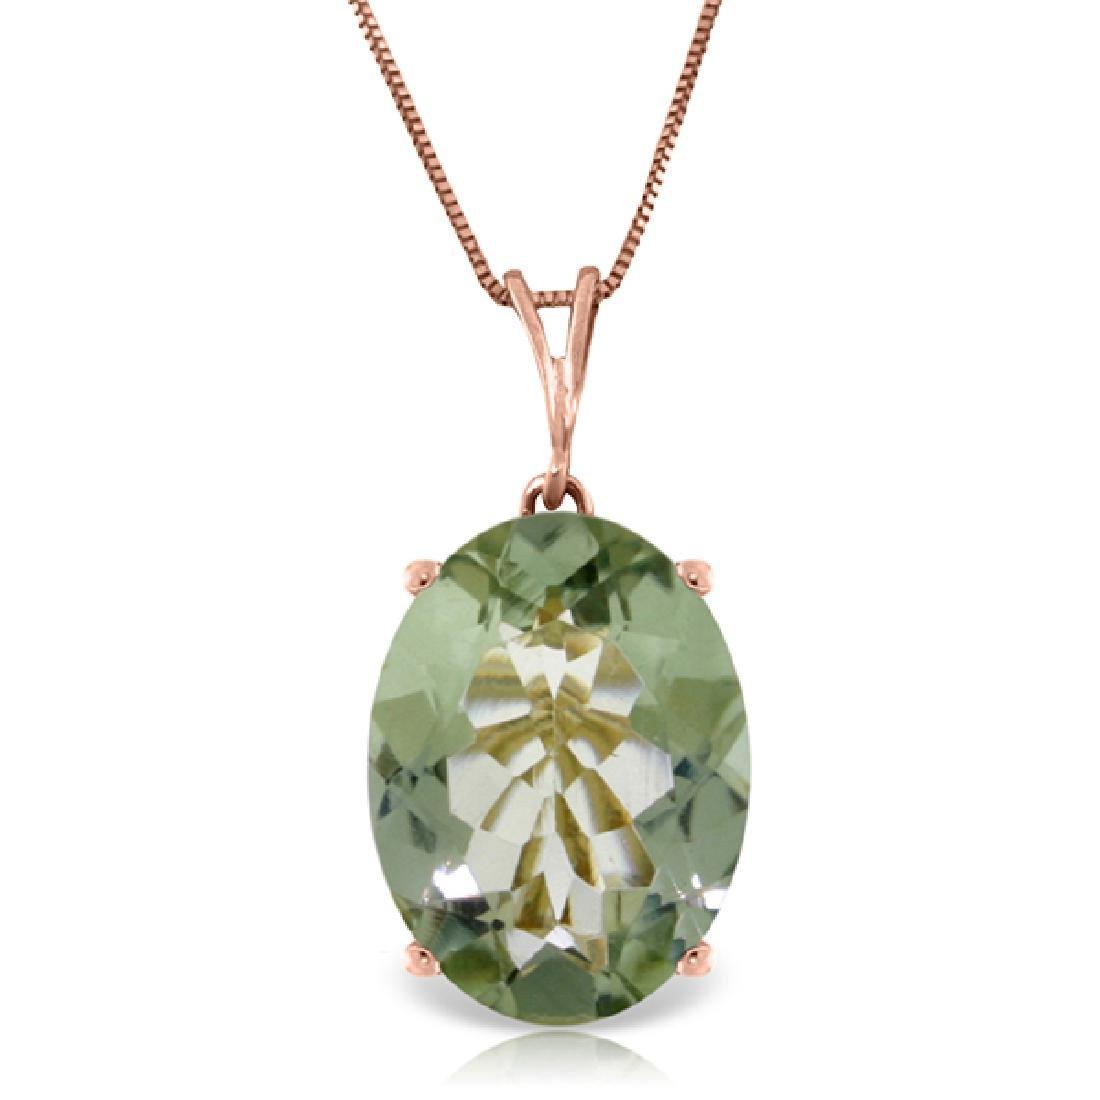 Genuine 7.55 ctw Green Amethyst Necklace Jewelry 14KT